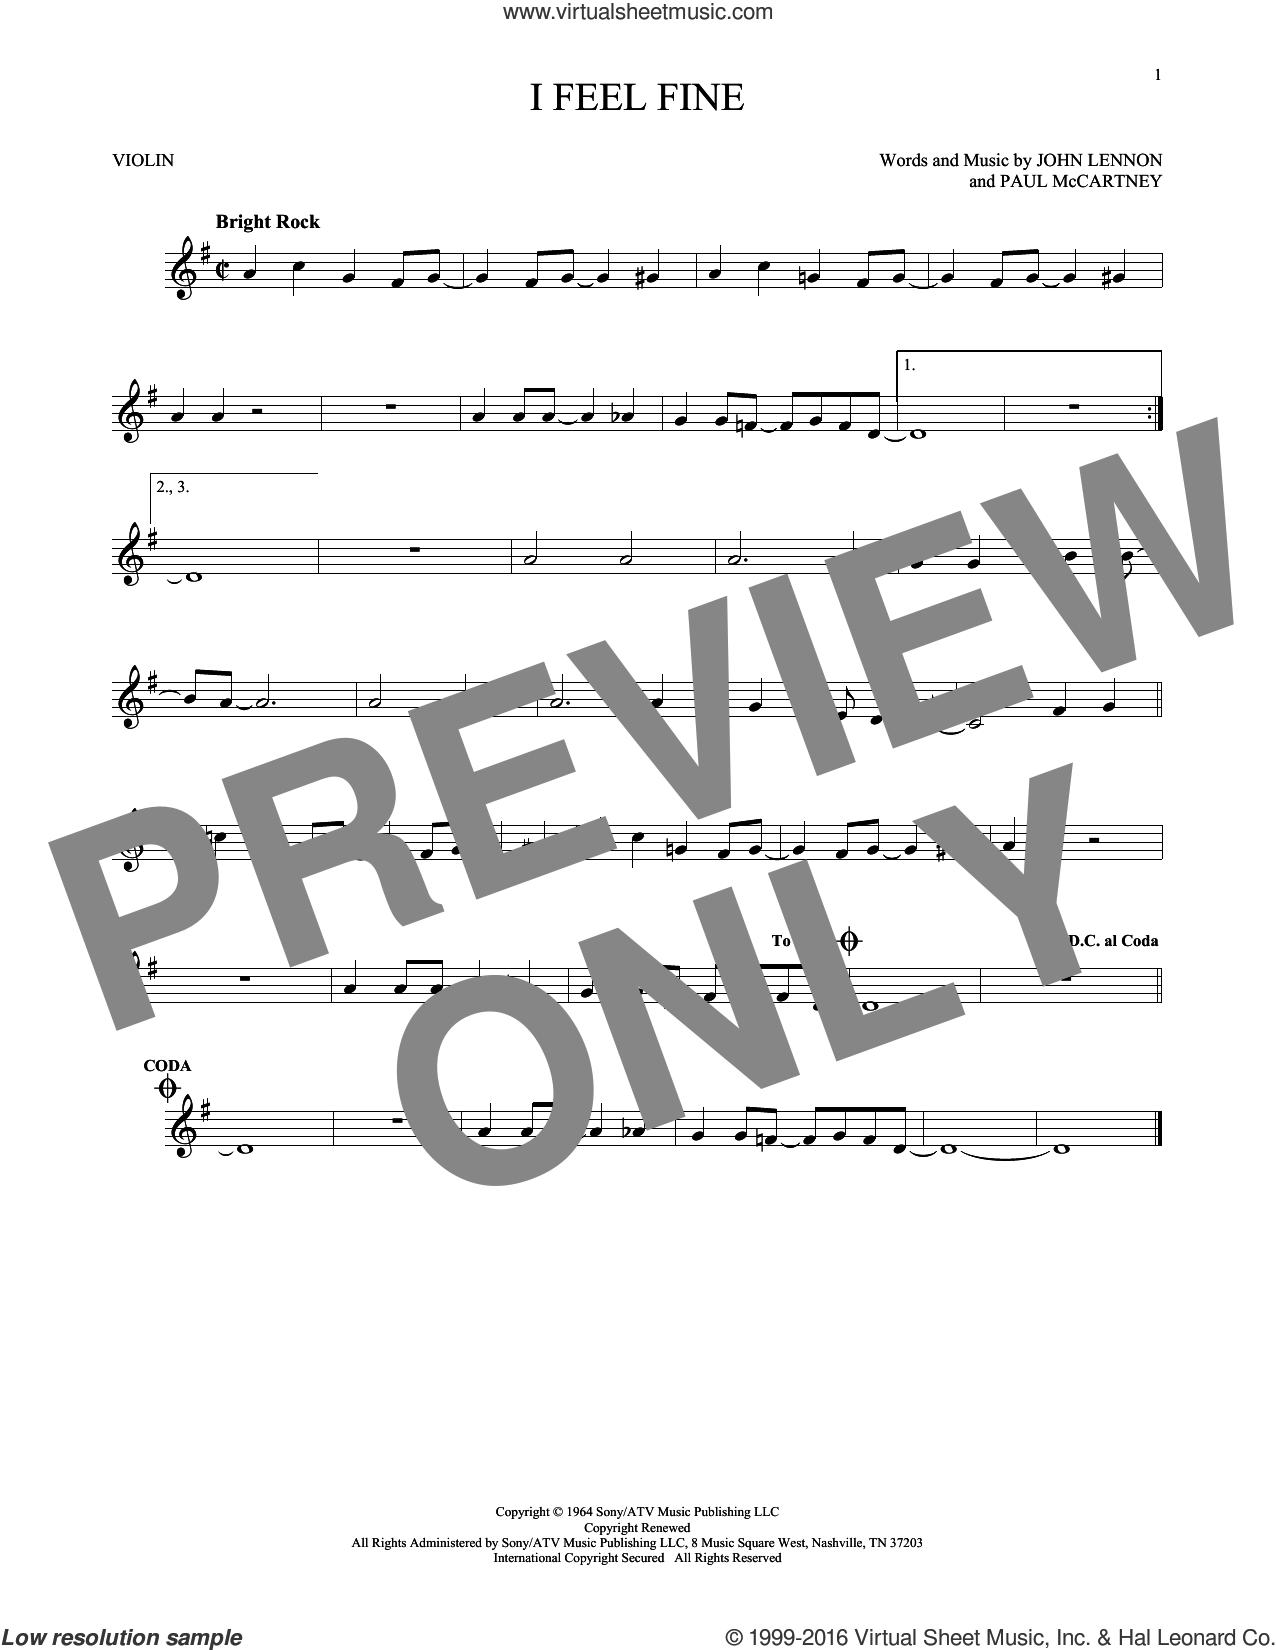 I Feel Fine sheet music for violin solo by The Beatles, John Lennon and Paul McCartney, intermediate skill level